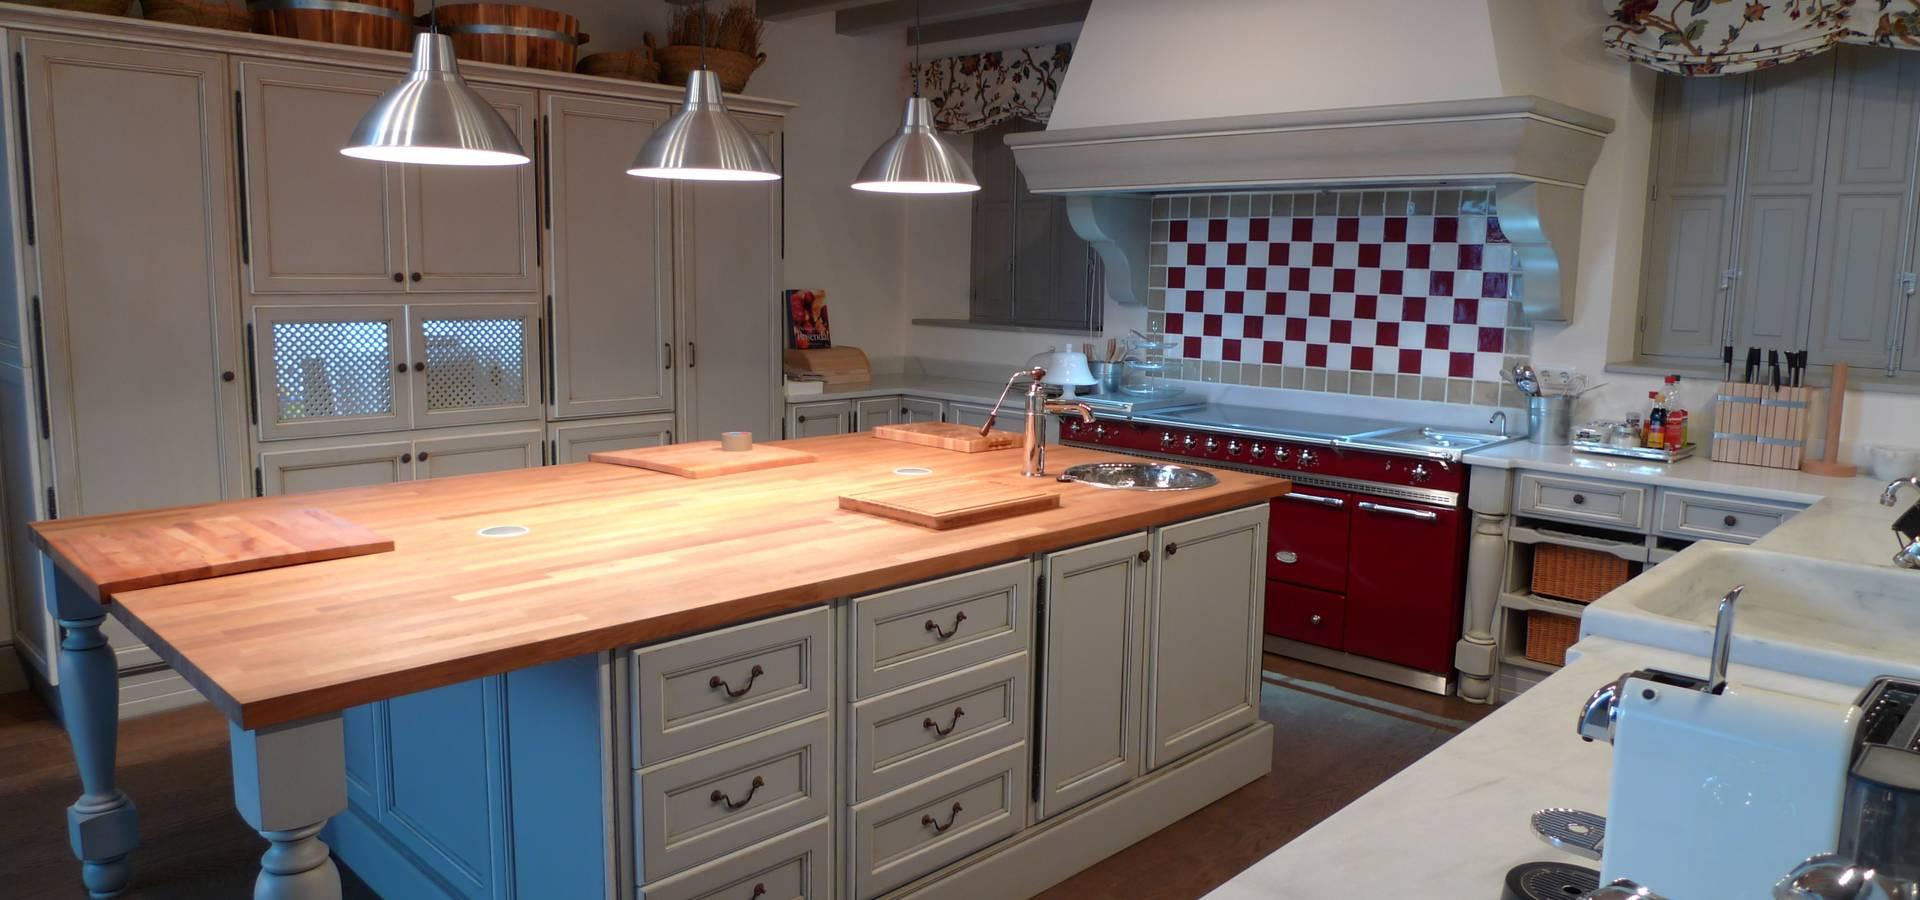 Gamahogar dise adores de cocinas en madrid homify - Disenadores de cocinas ...